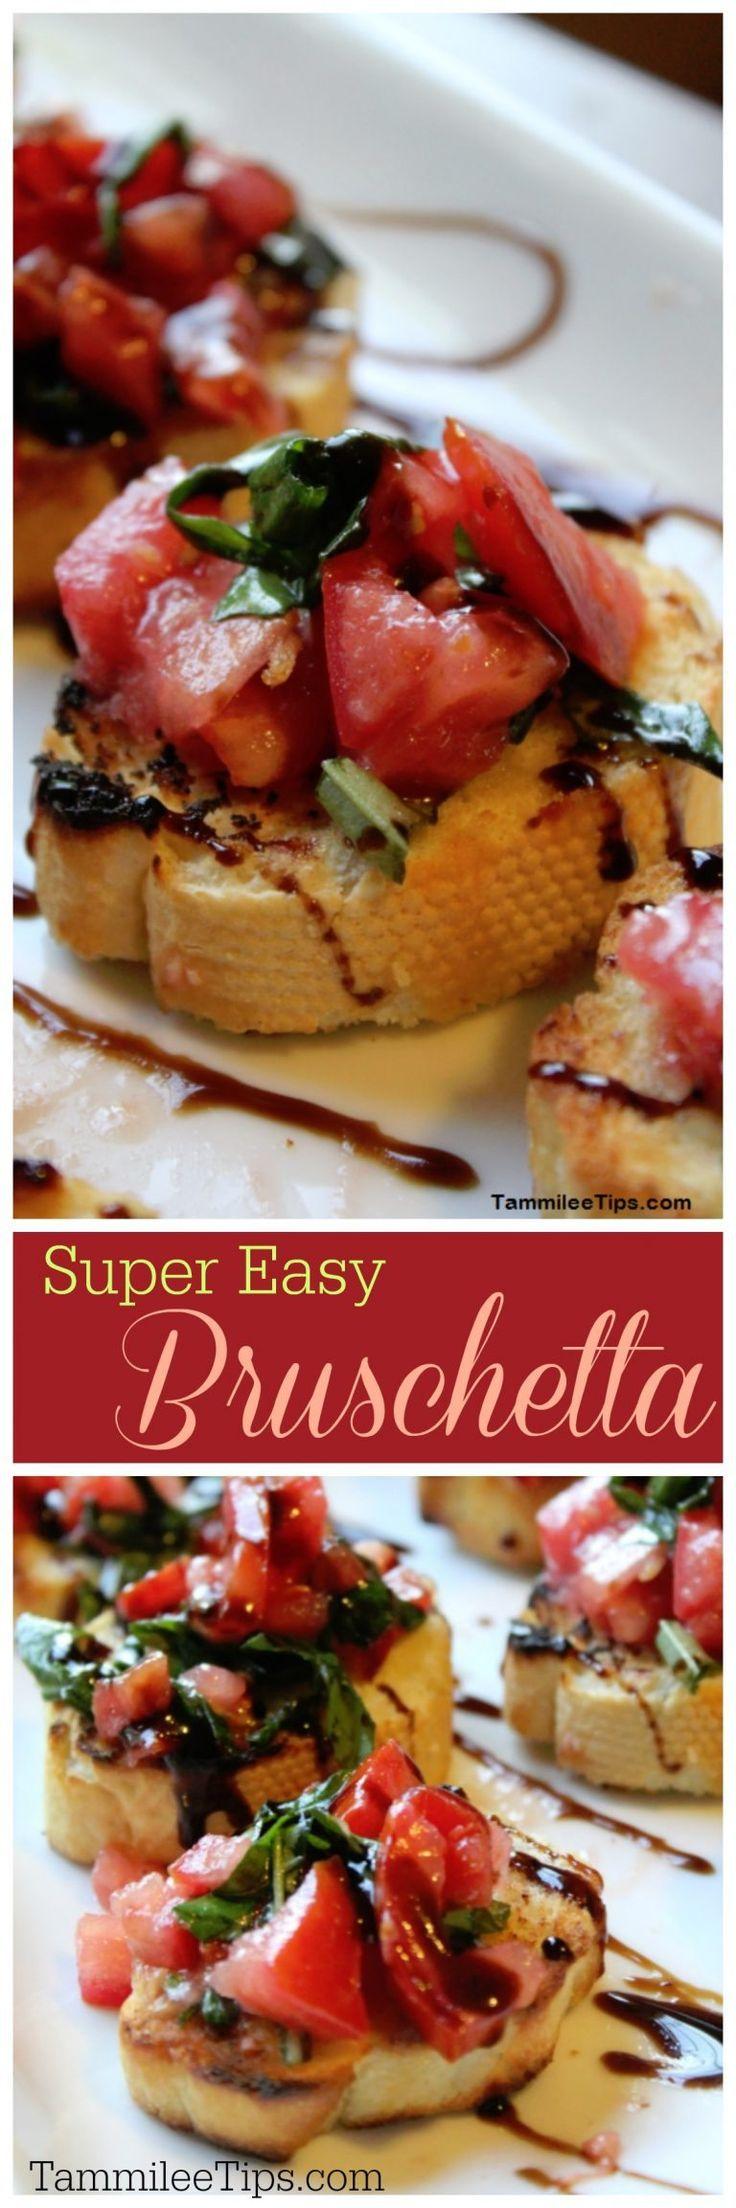 25+ Best Ideas About Easy Bruschetta Recipe On Pinterest